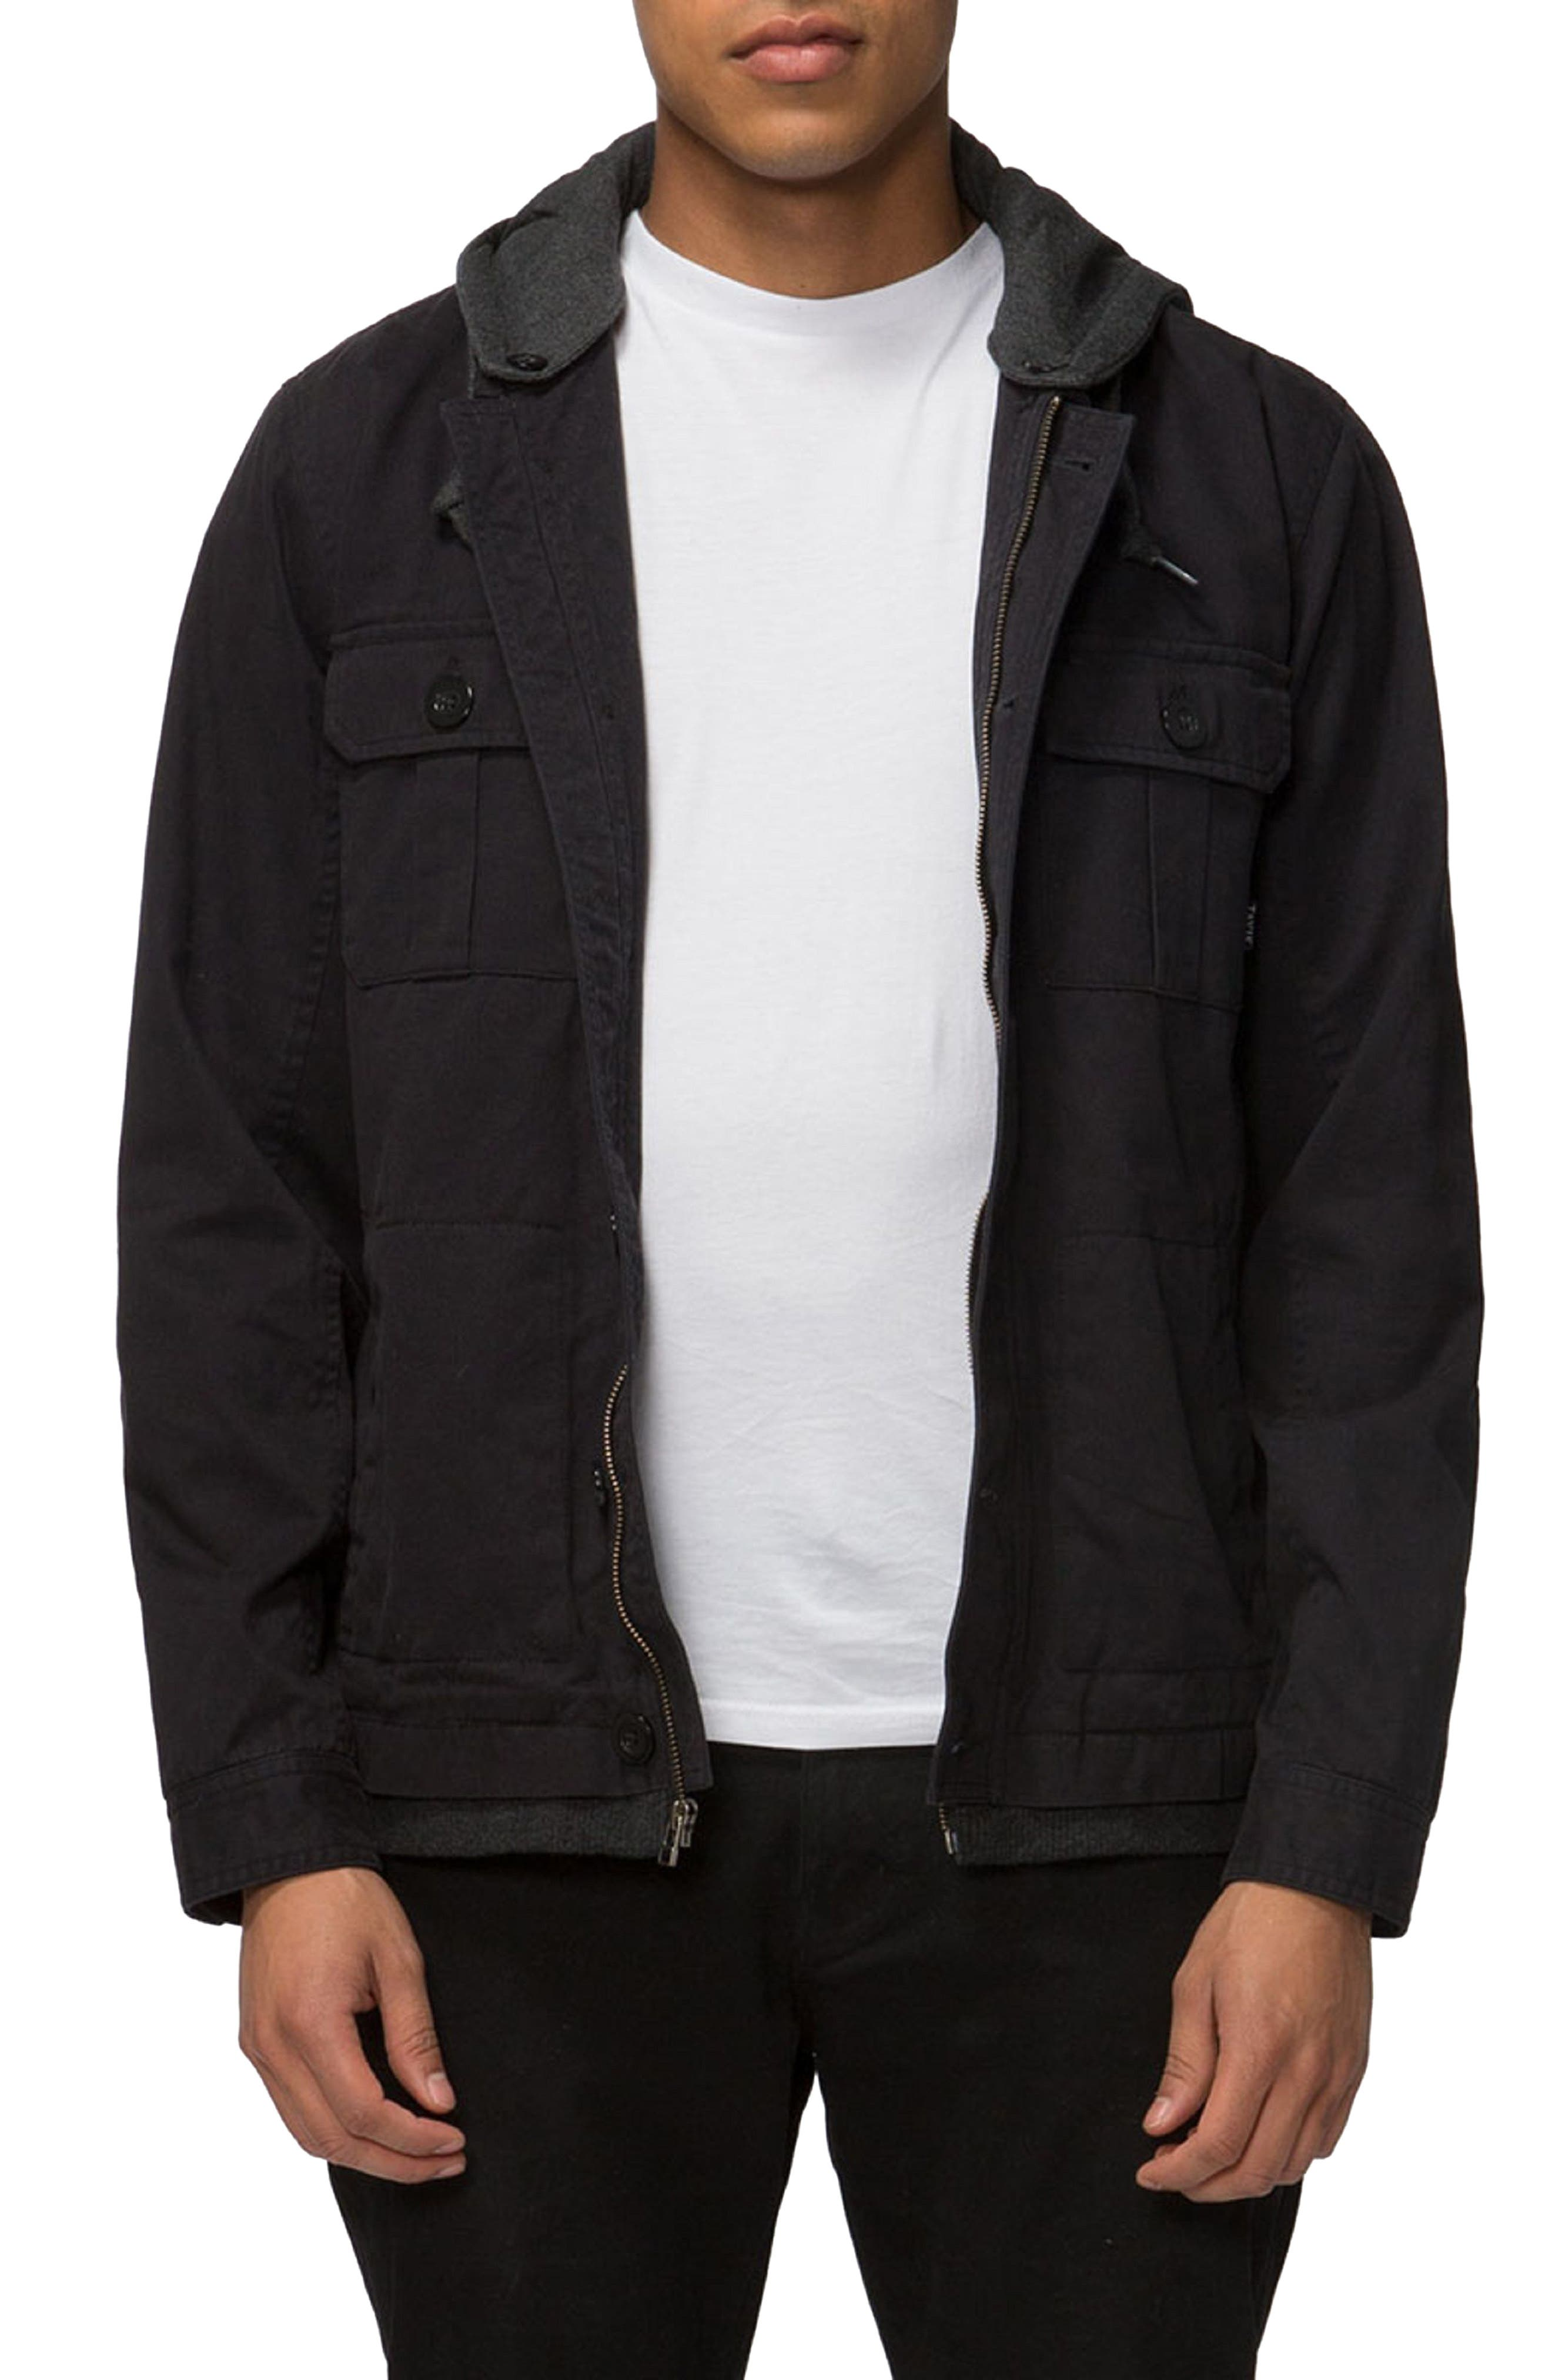 Droogs Field Jacket with Detachable Hood,                             Main thumbnail 1, color,                             Black/ Heather Black